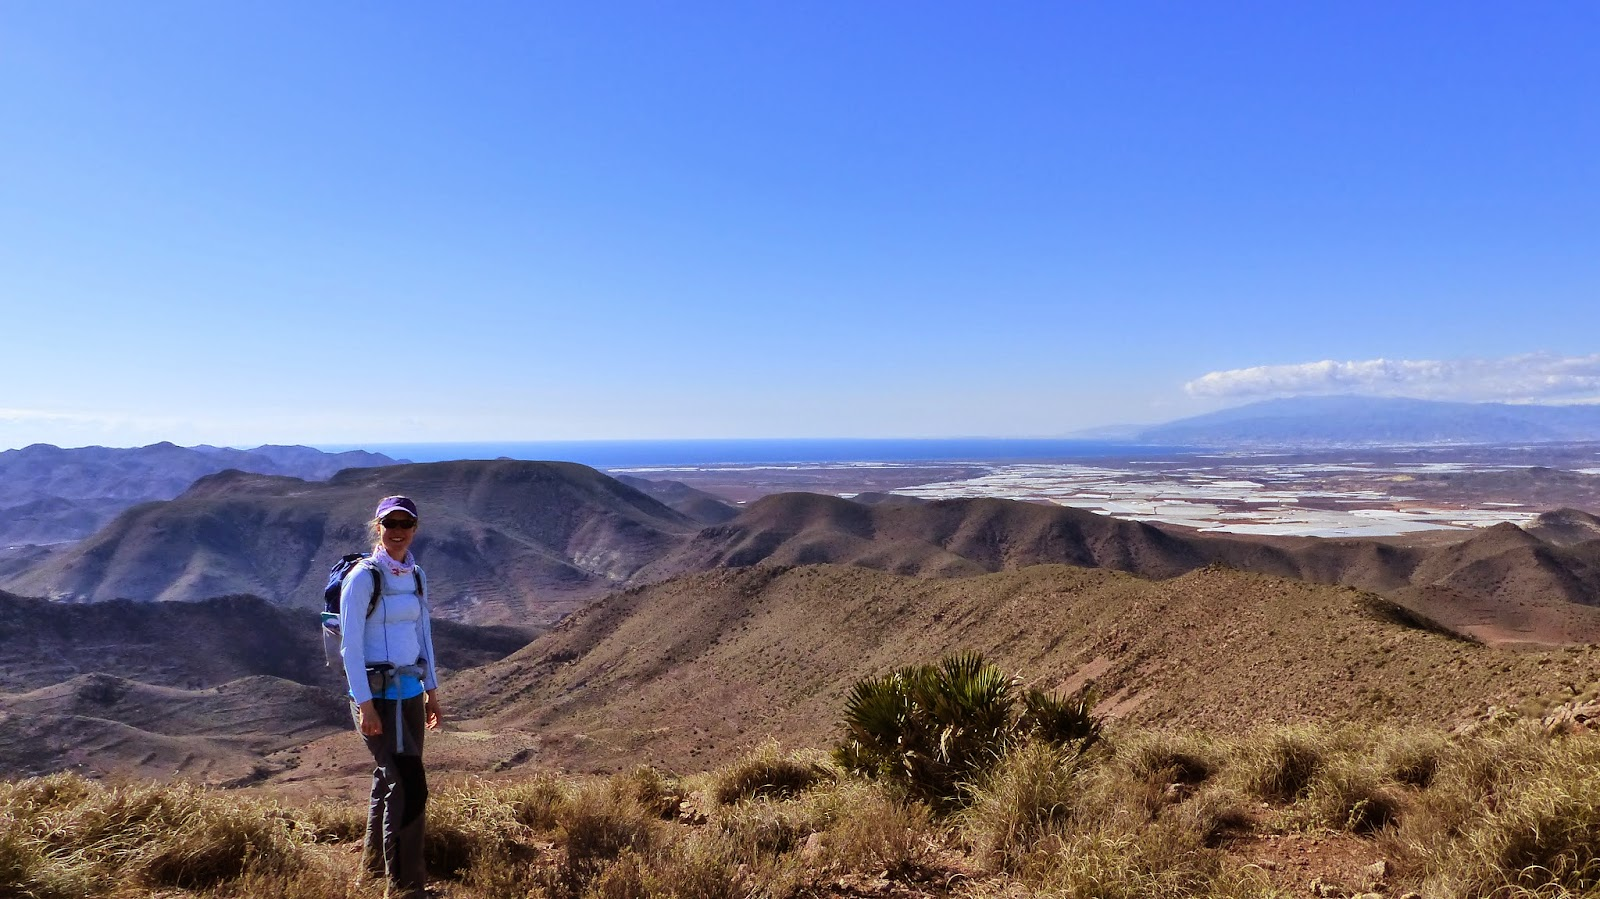 Cerro Penones looking over Caldera Majada Redonda